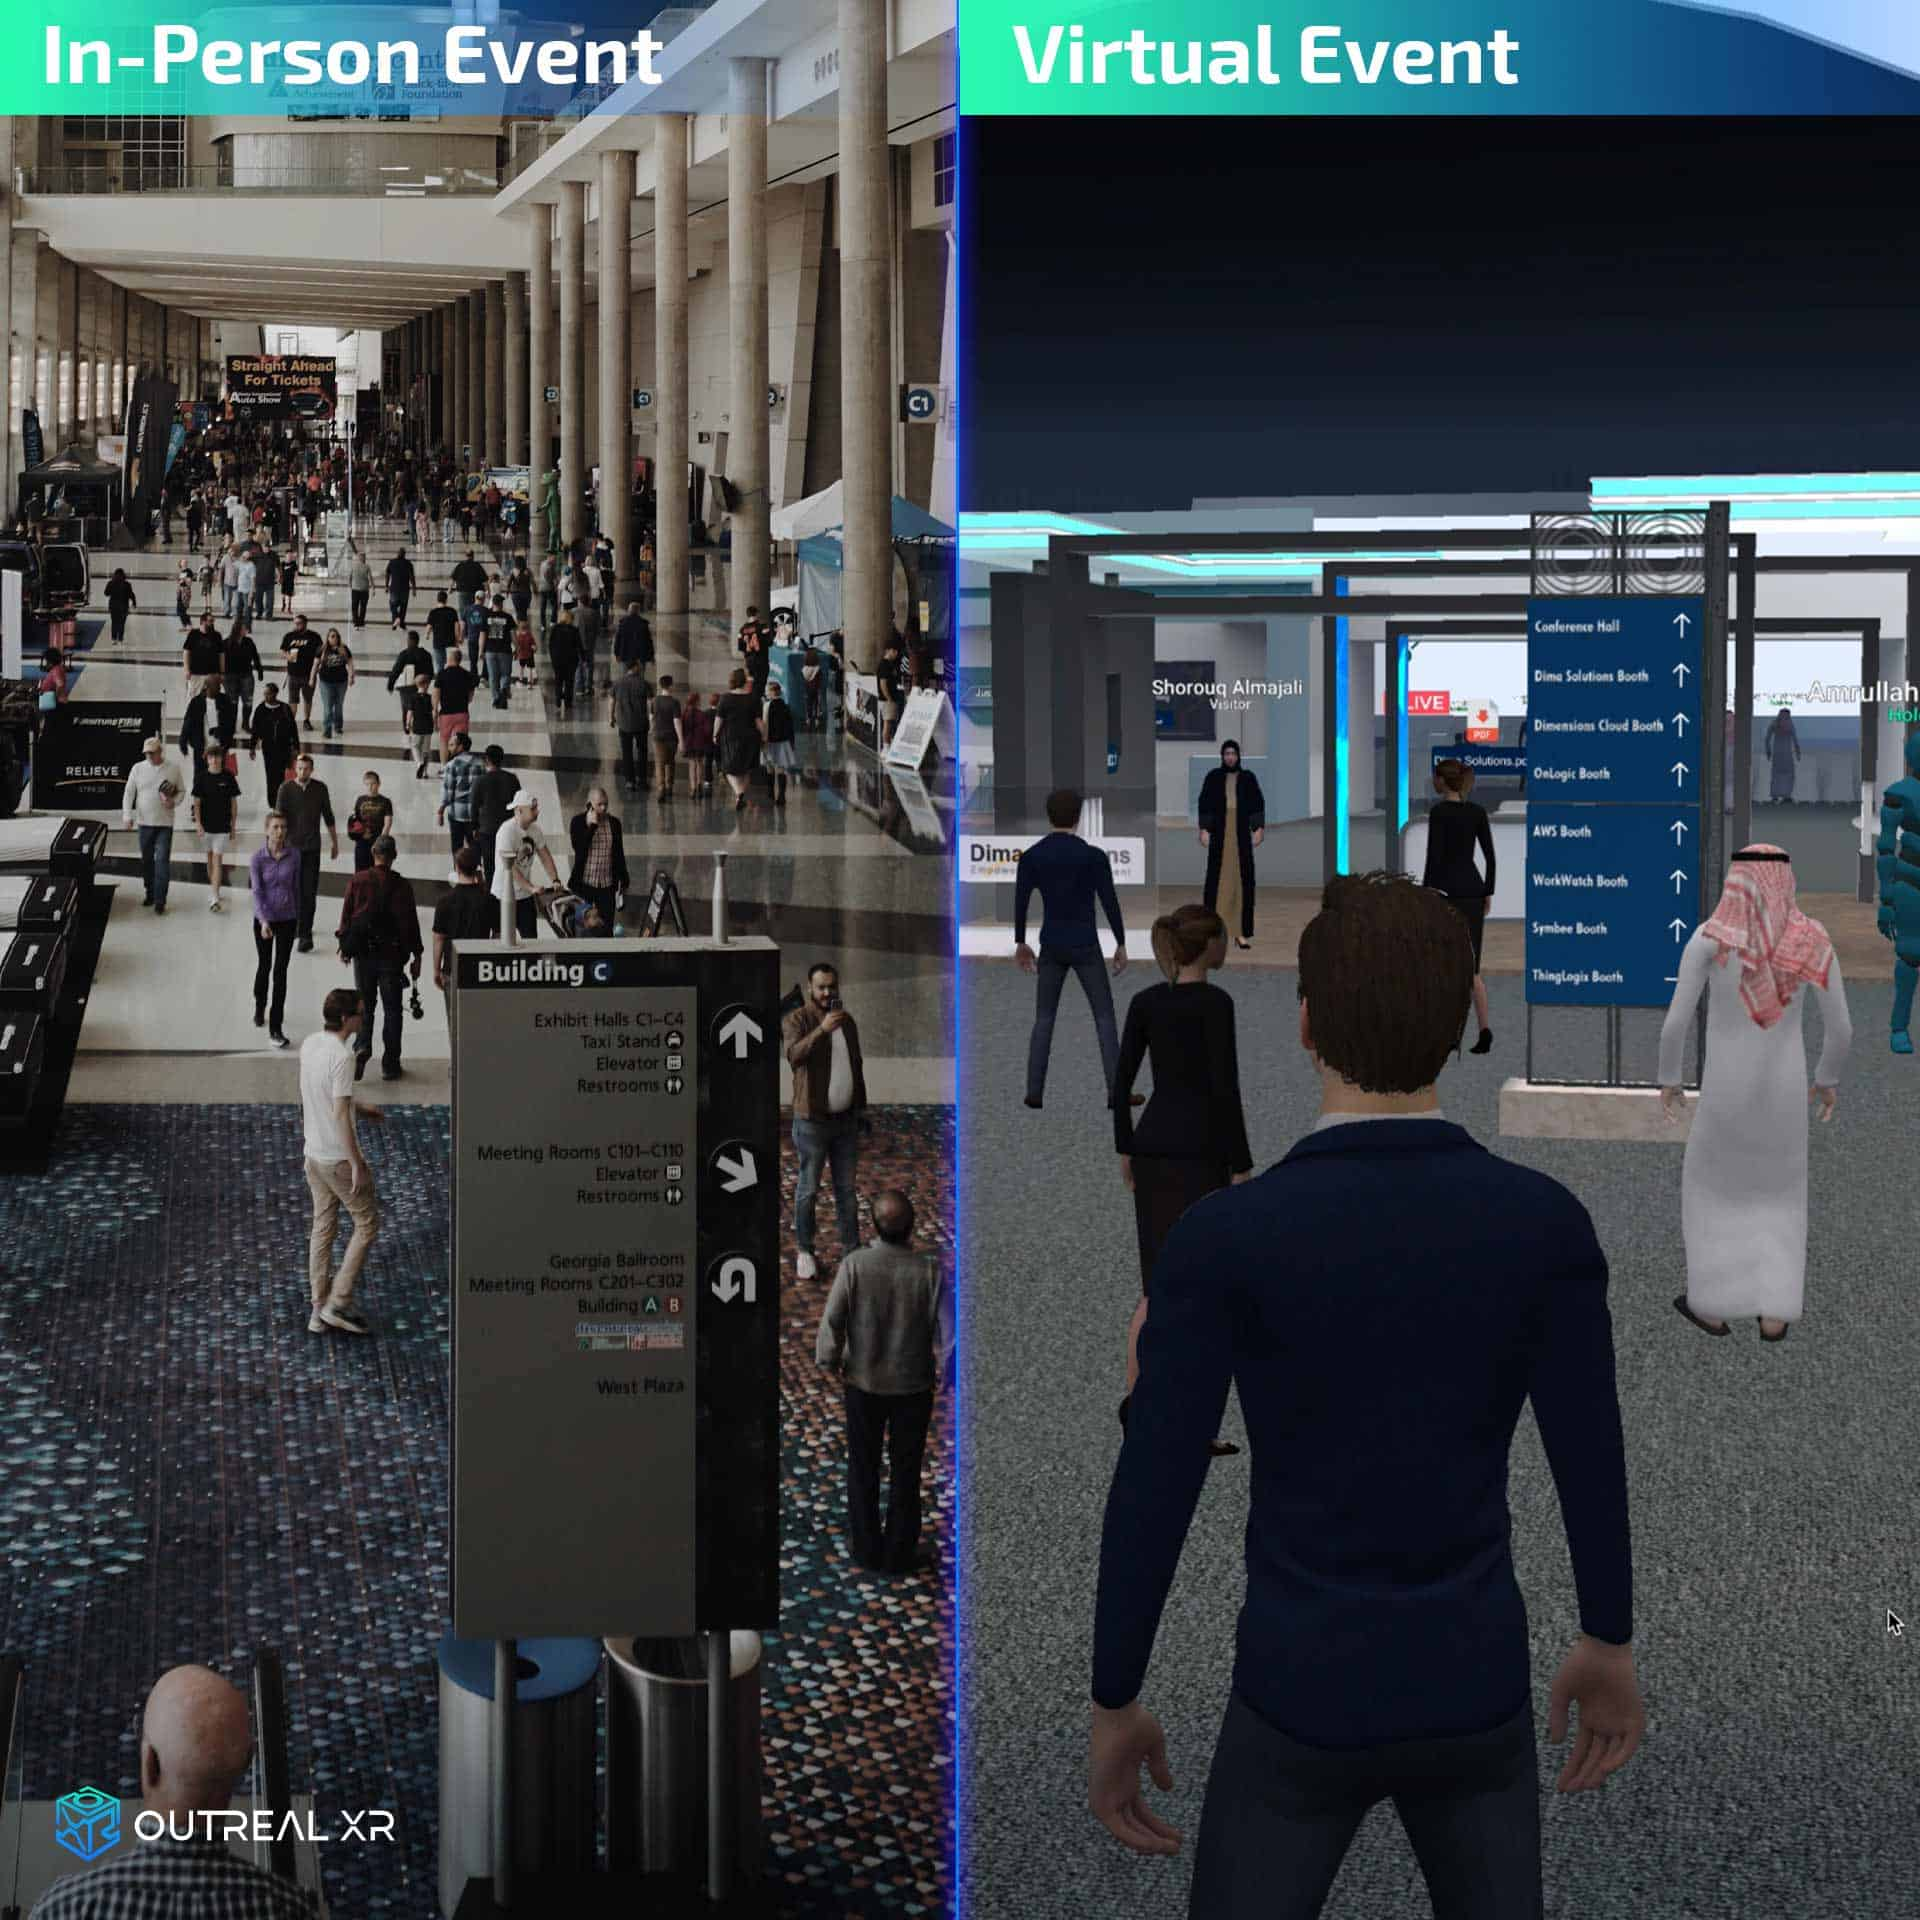 Hybrid exhibition event